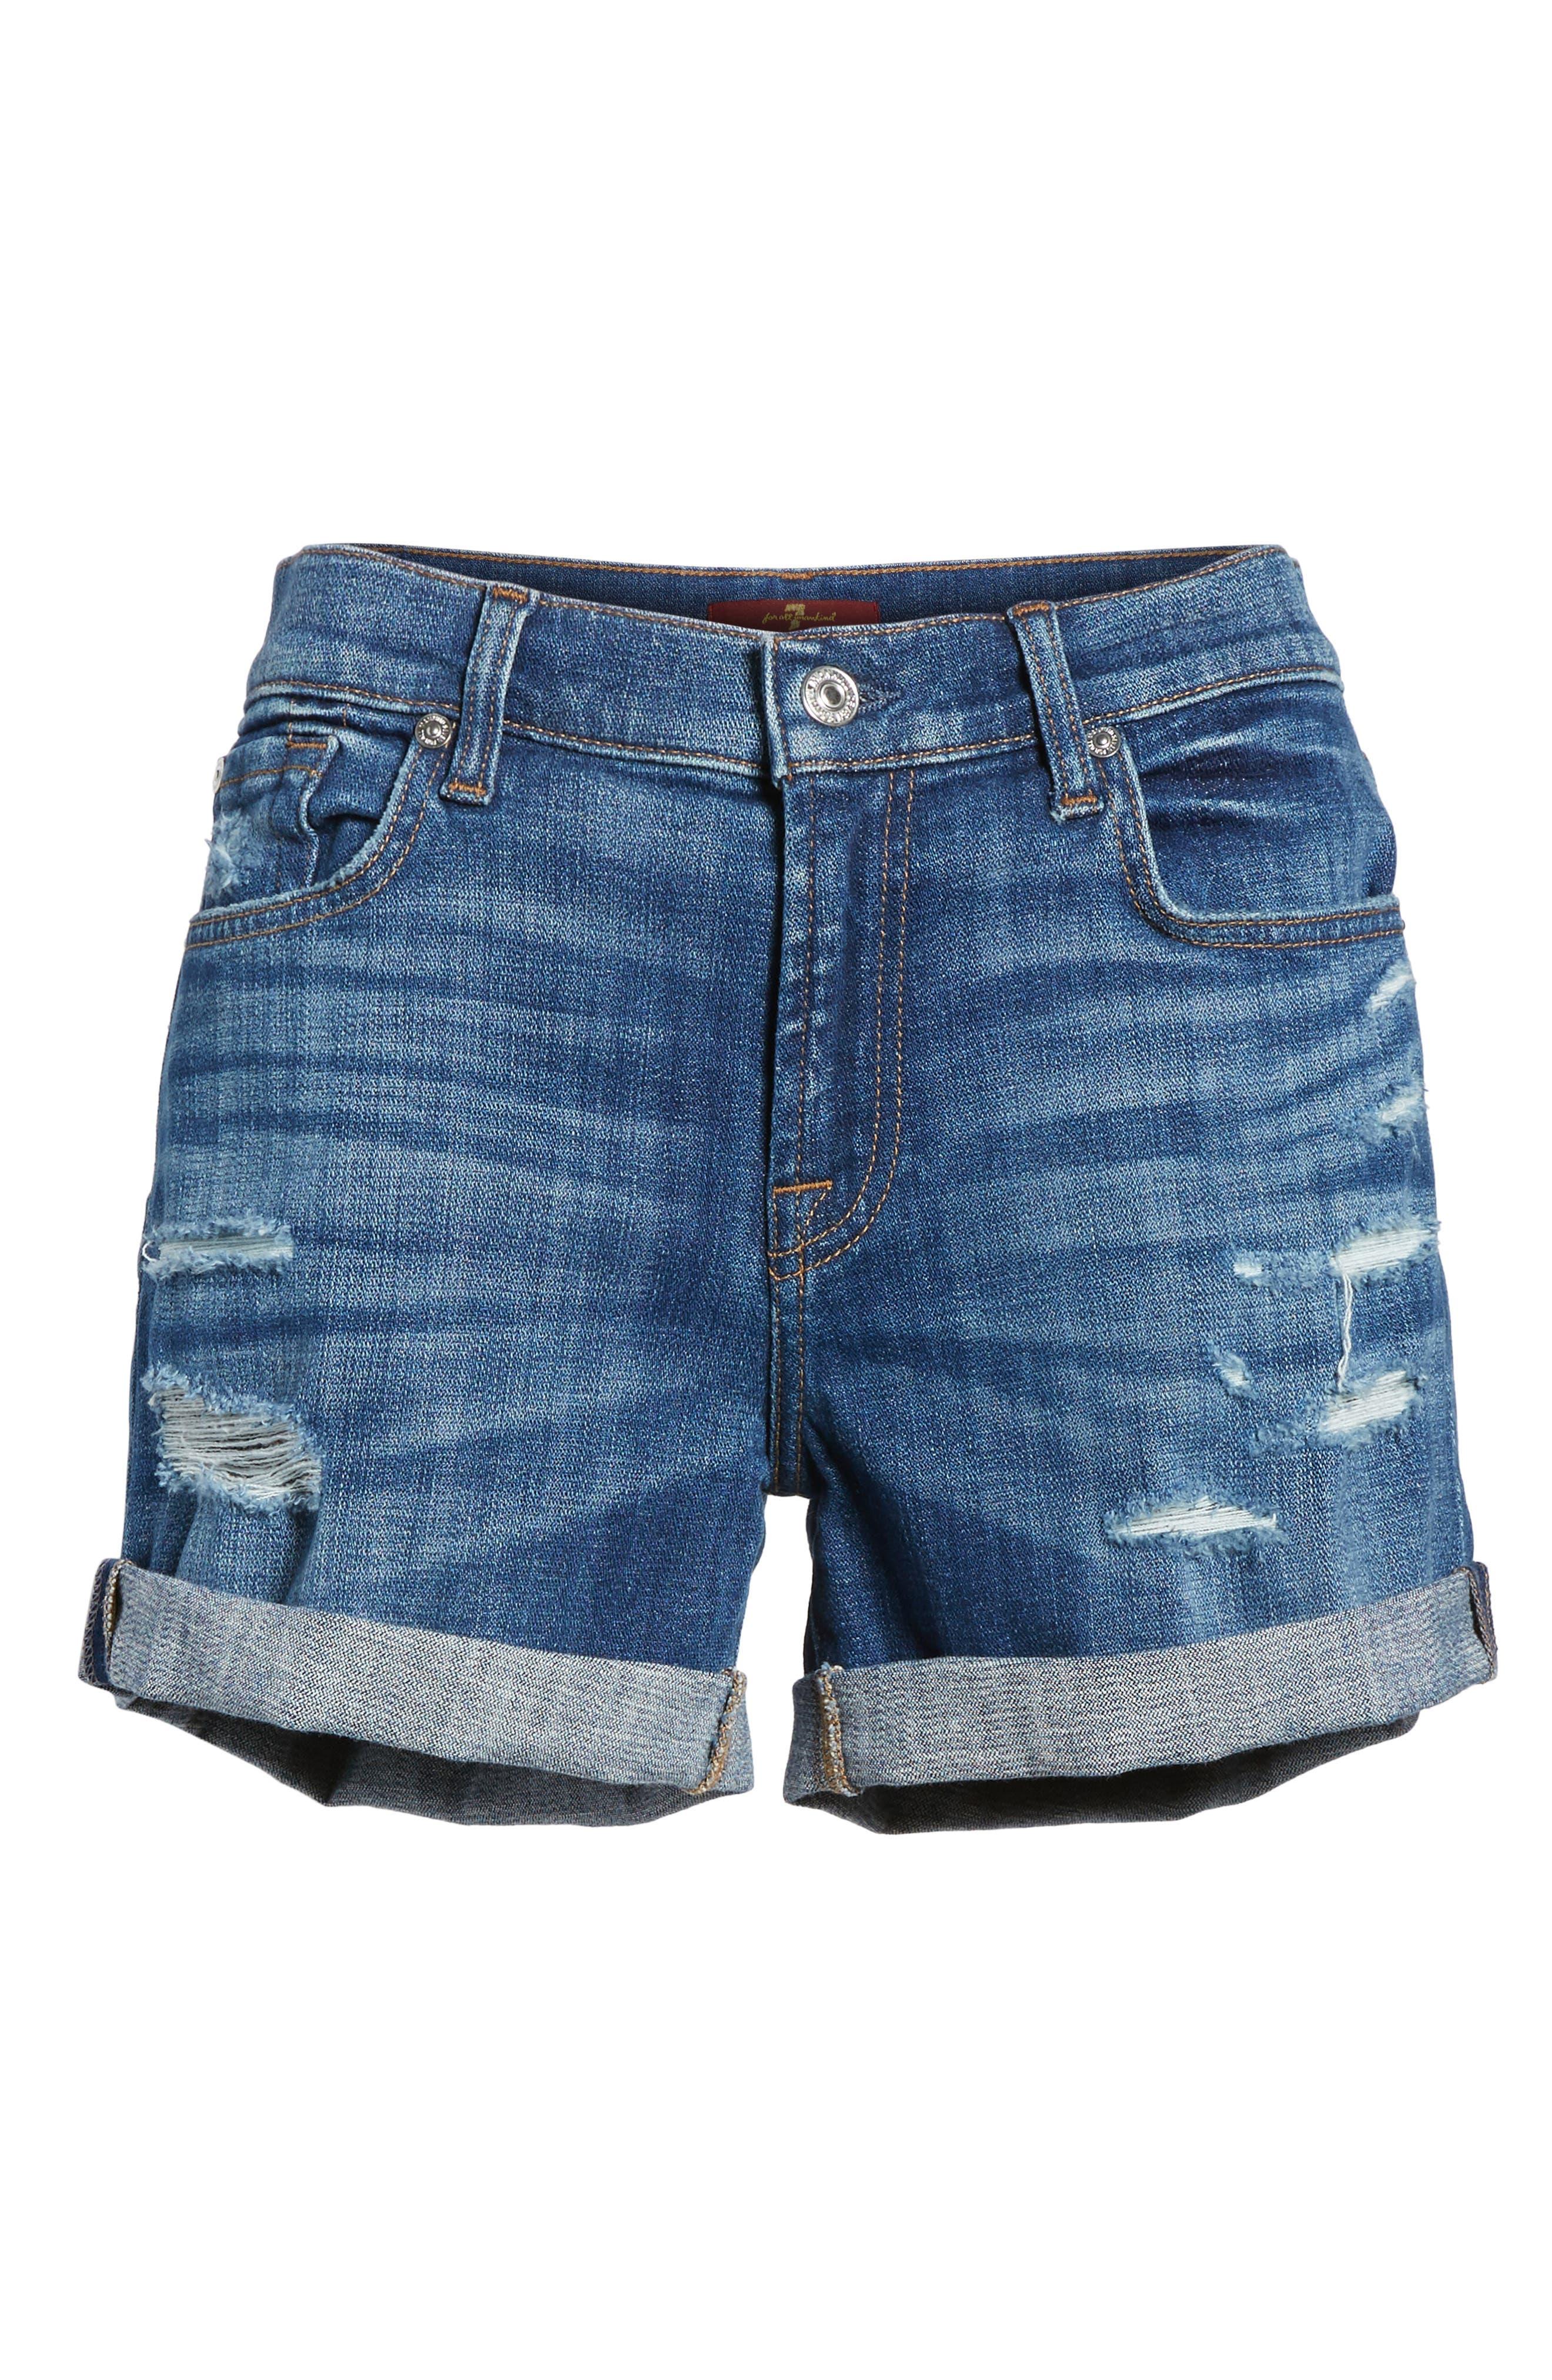 Roll Cuff Denim Shorts,                             Alternate thumbnail 13, color,